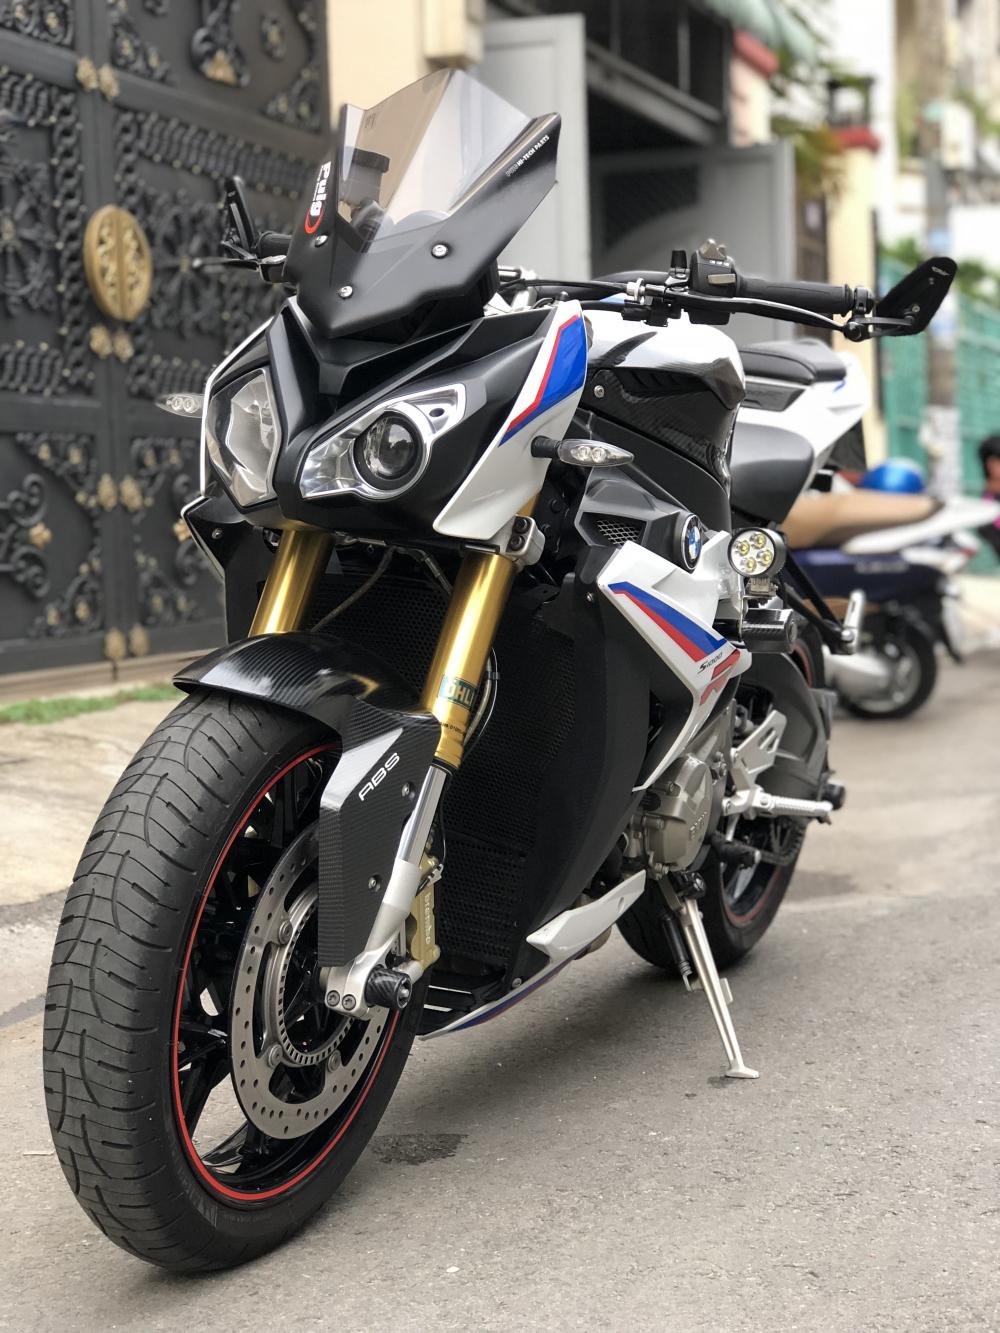 __Ban BMW S1000R ABS date 82014 phien ban Chau Au Full Opstionodo hon 15000km xe dep ngay chu - 5